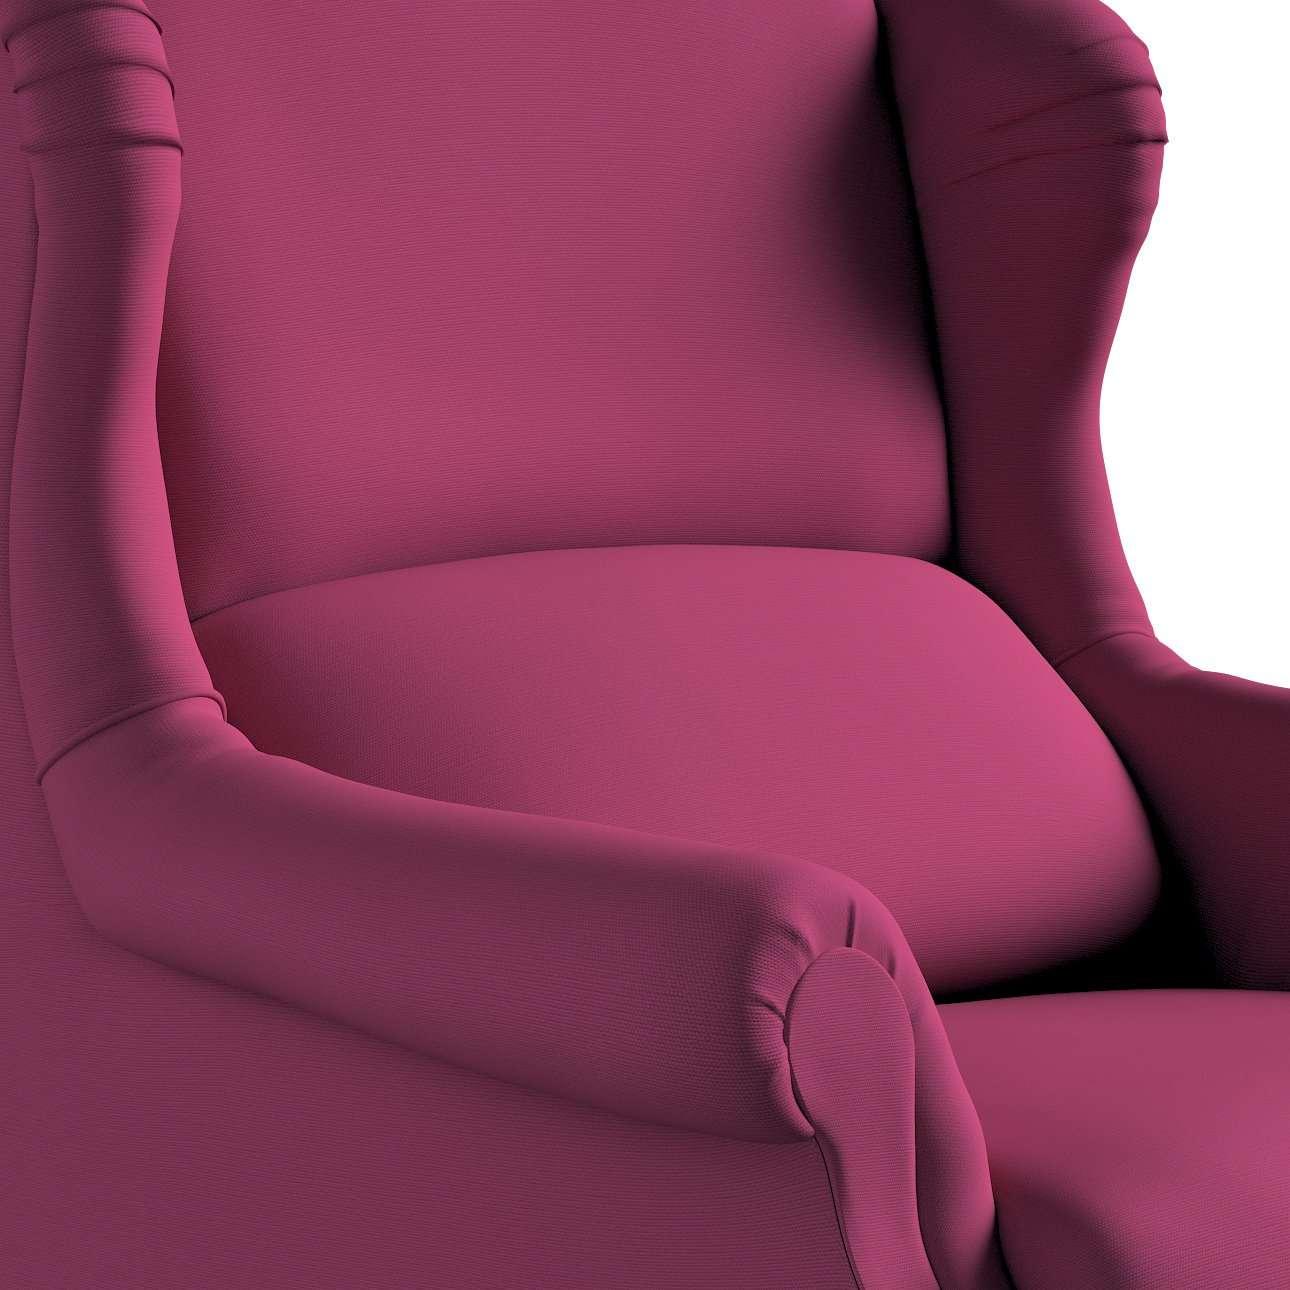 Fotel Unique w kolekcji Cotton Panama, tkanina: 702-32